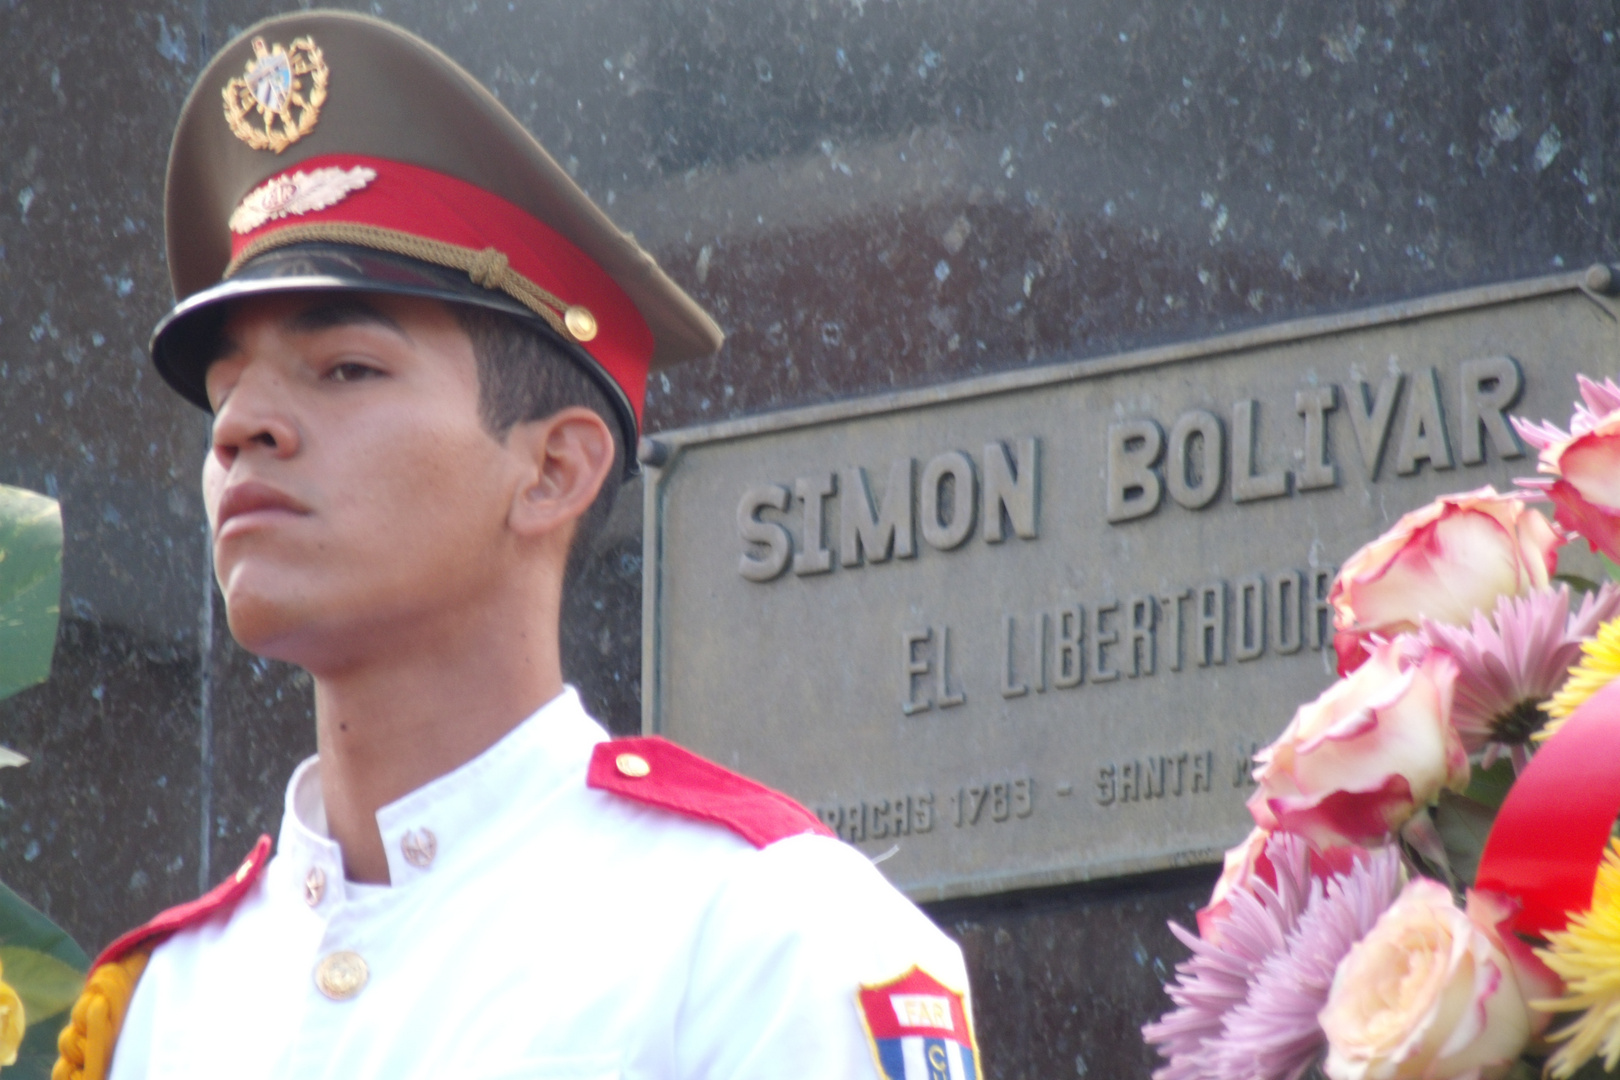 Visión Bolívar y Martí